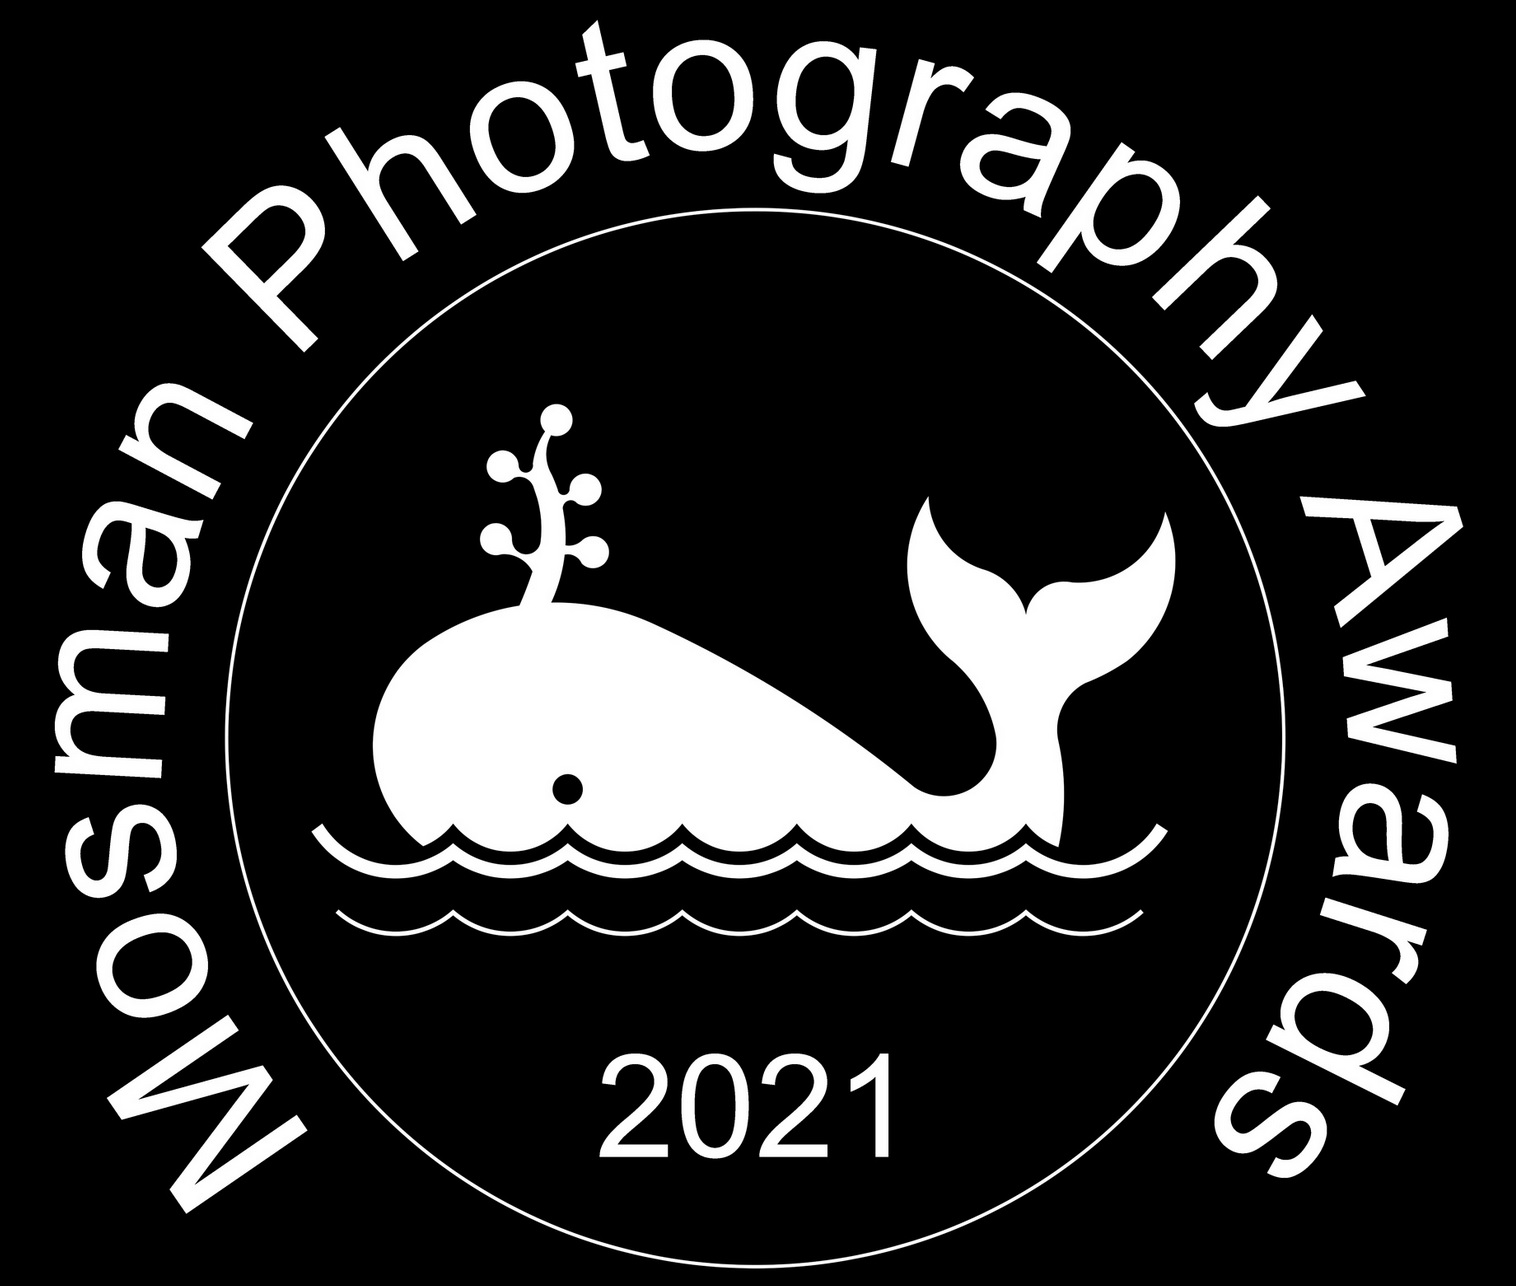 Mosman Photography Awards 2021 - logo